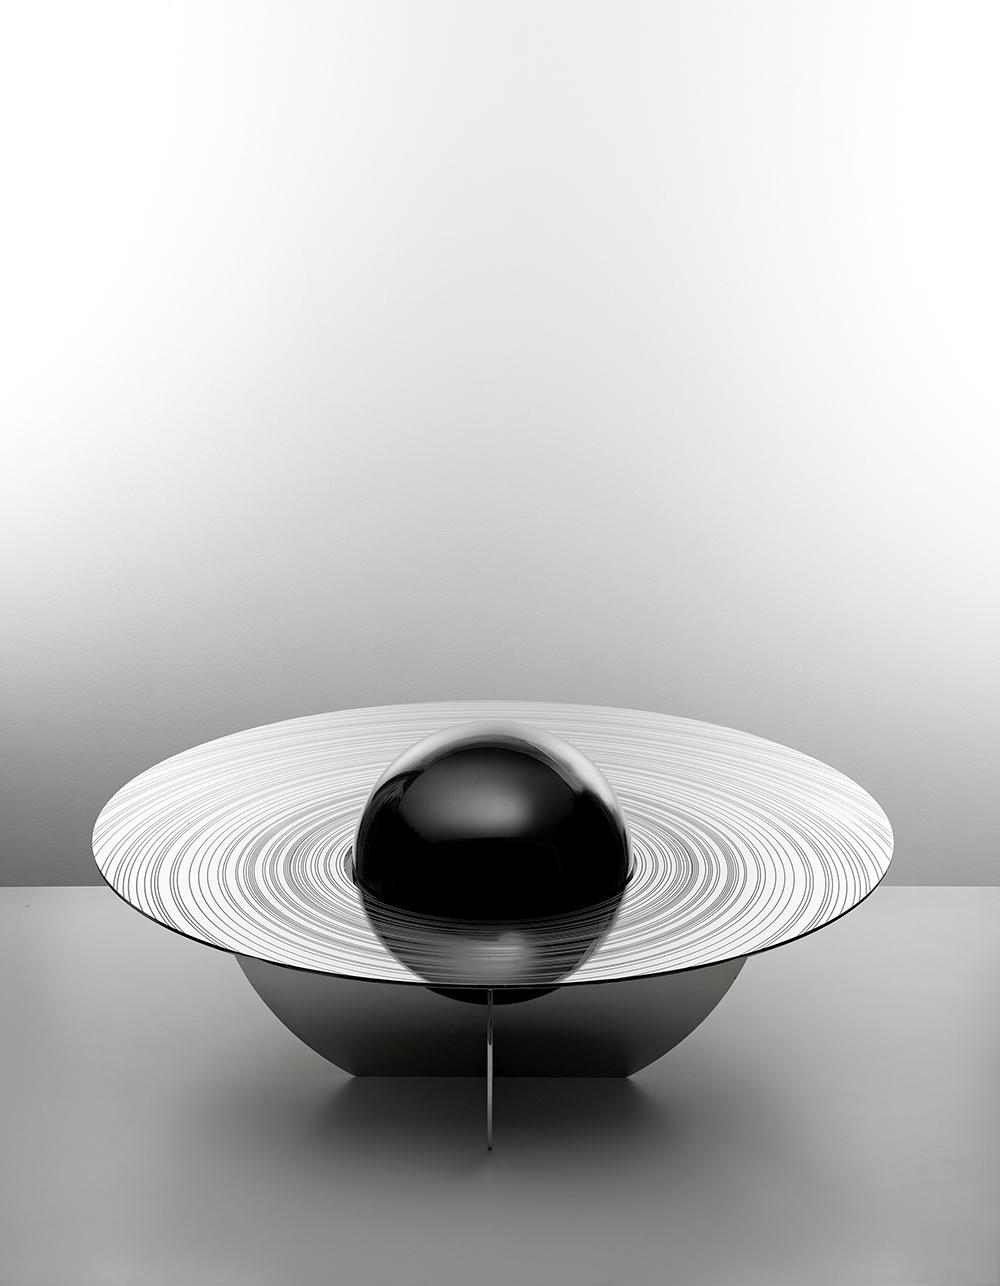 Brooksbank&Collins_Boullee_Image 4_Black Sphere